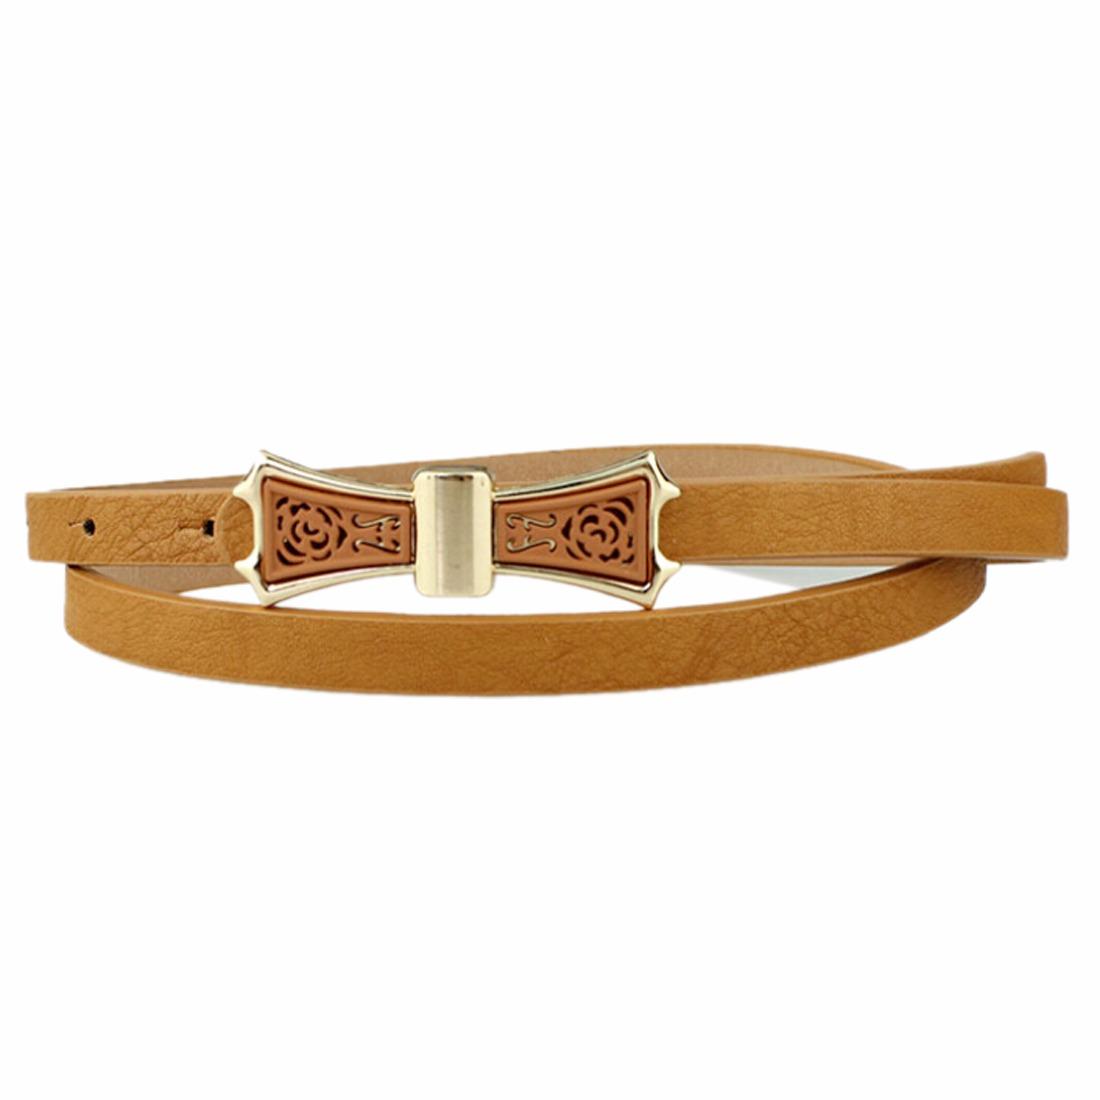 New Womens Wide Bowknot Metal Buckle Adjustable Waist Belt Skinny Thin Waistband